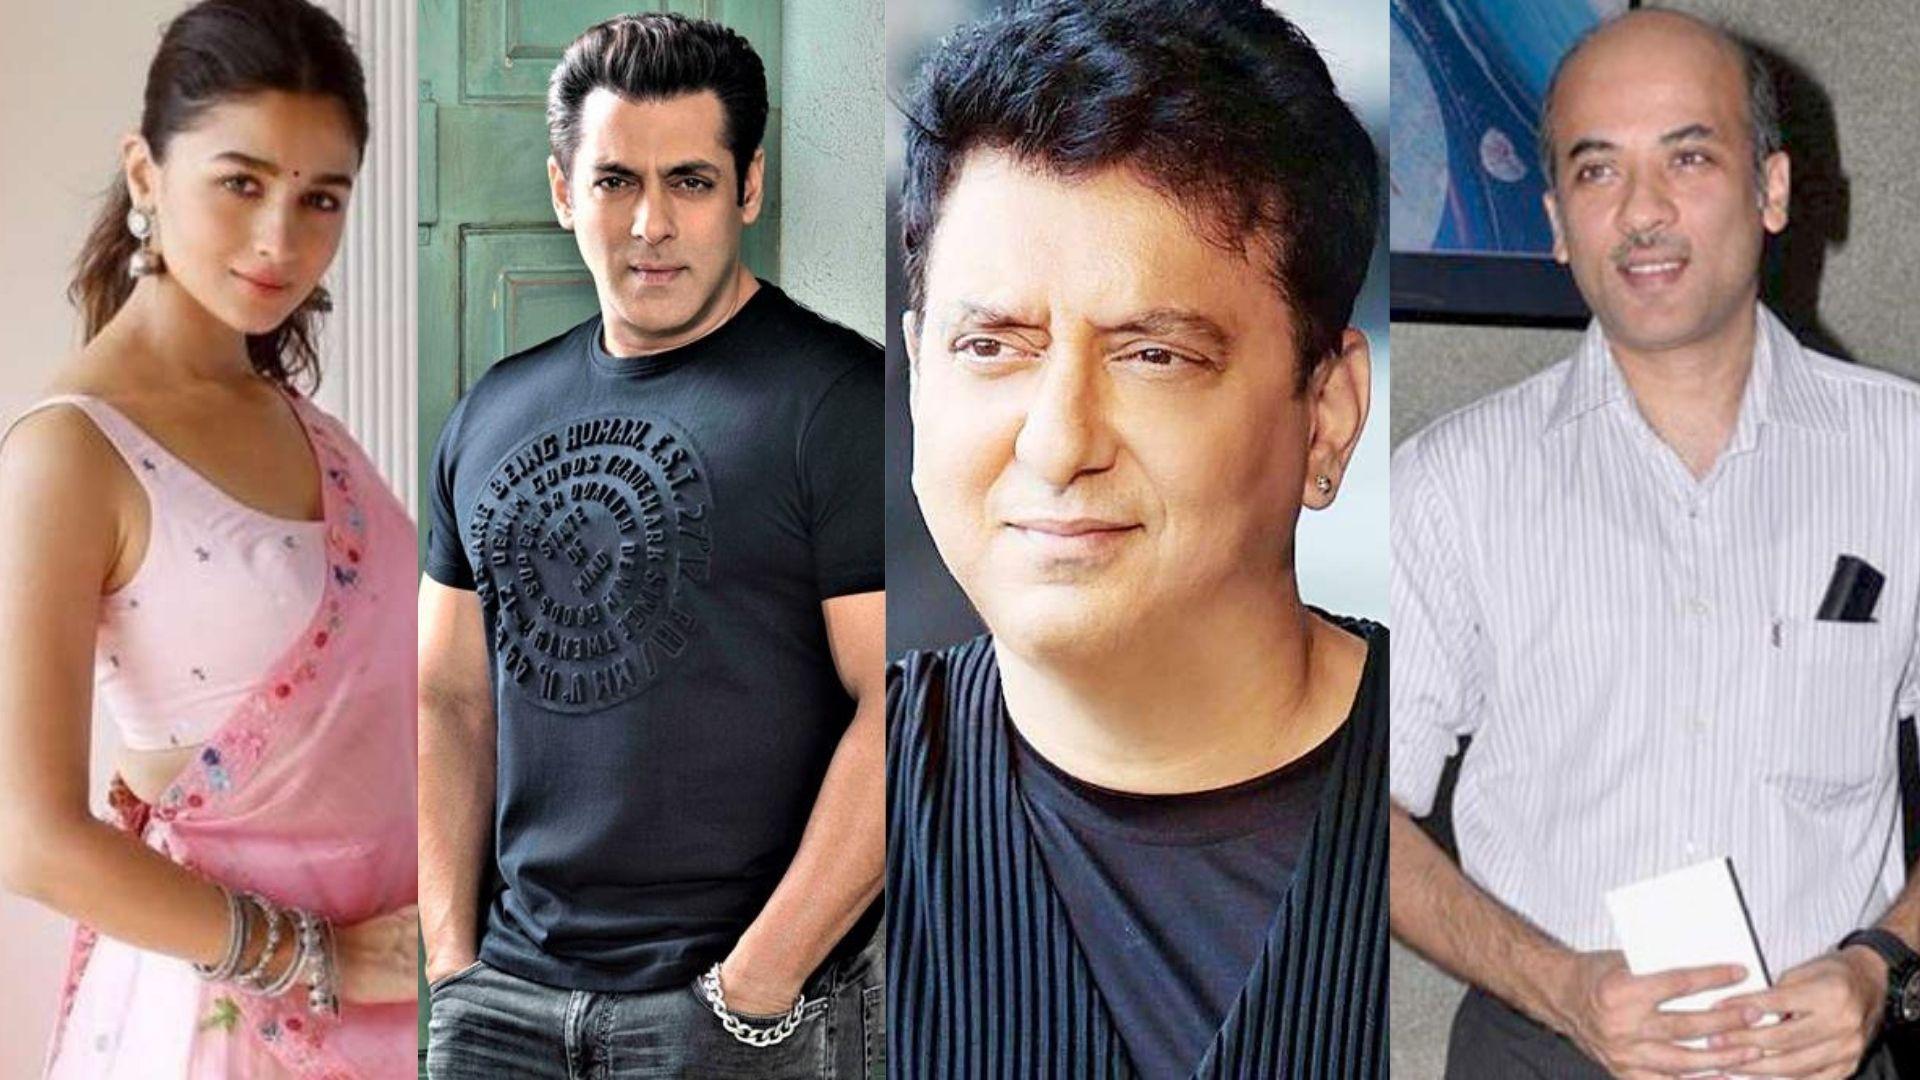 Salman Khan Docu-Series: Alia Bhatt, Sajid Nadiadwala And Sooraj Barjatya To Be A Part Of The Series?